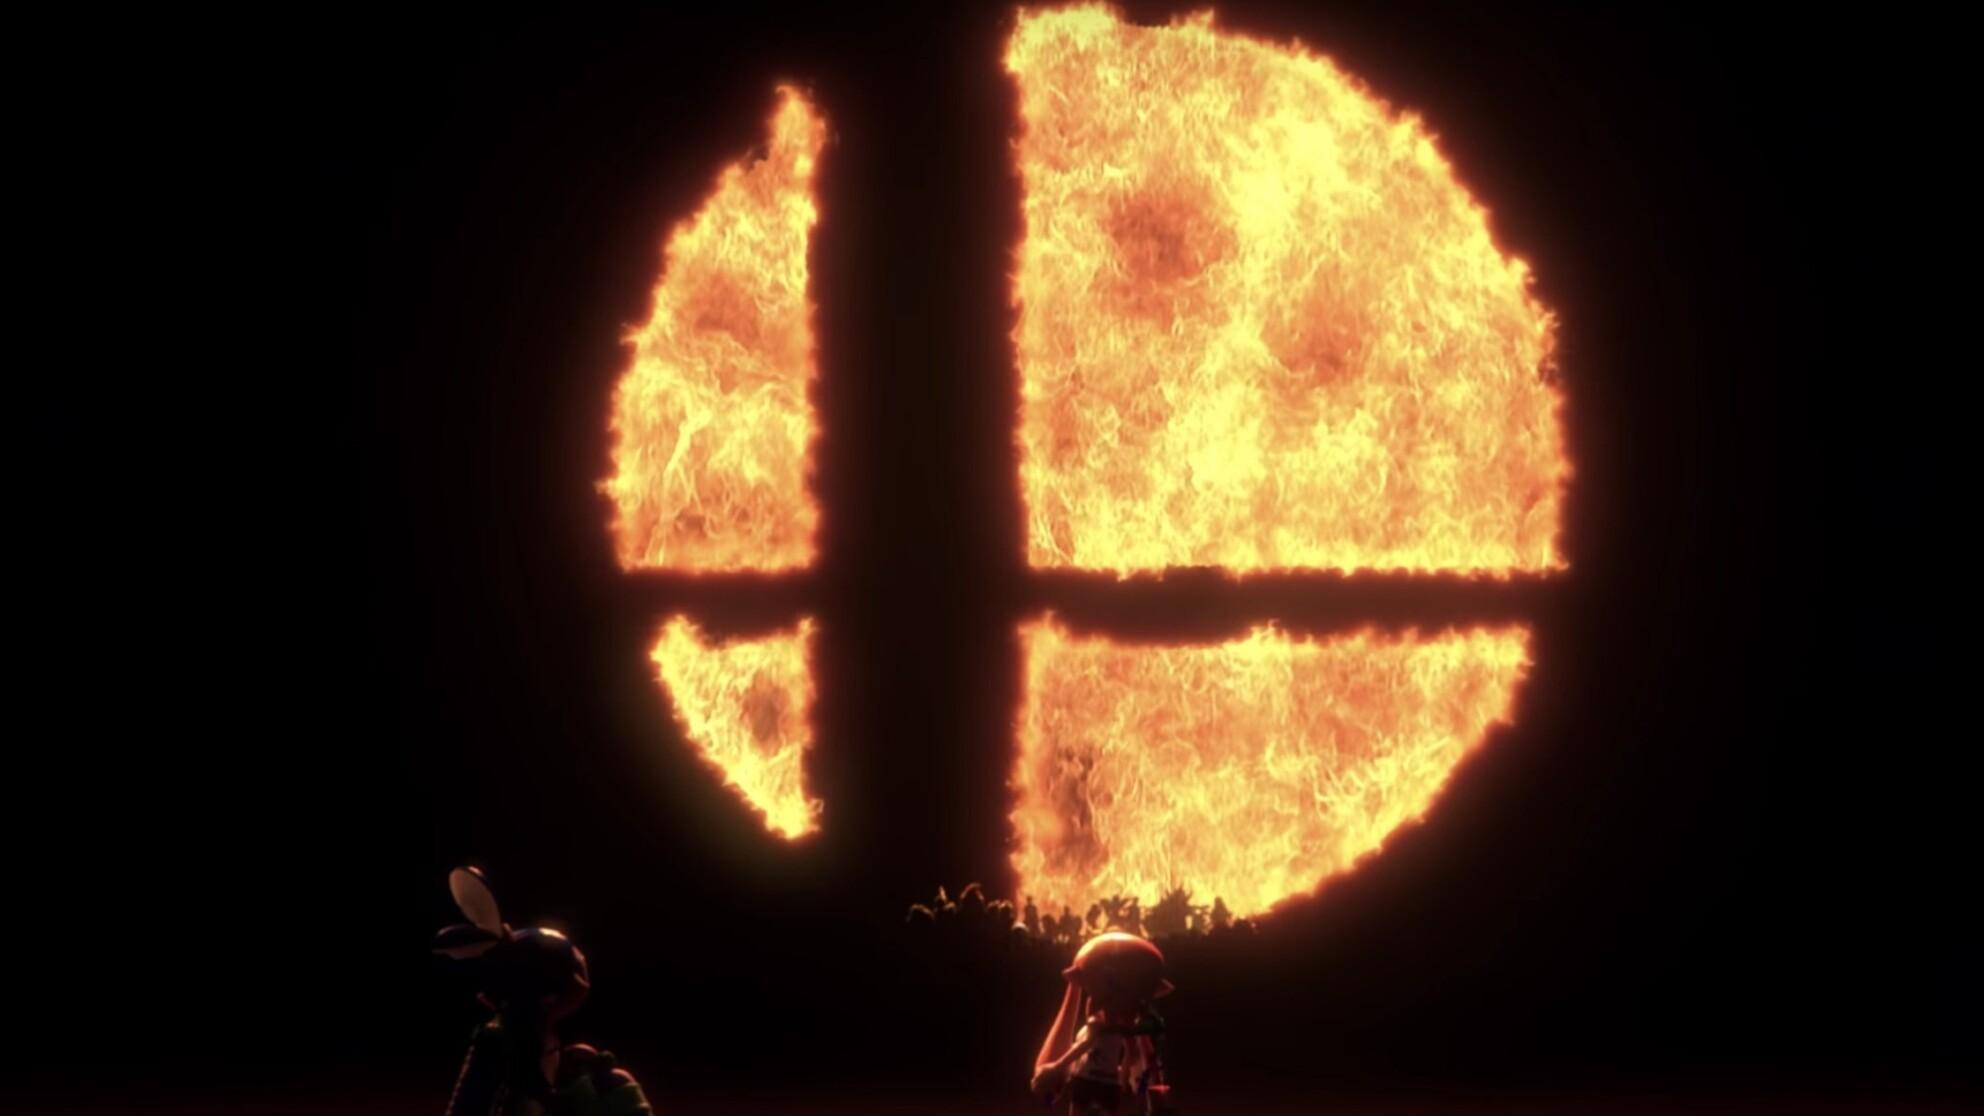 Super Smash Bros. Ultimate live stream reveal set for January 16